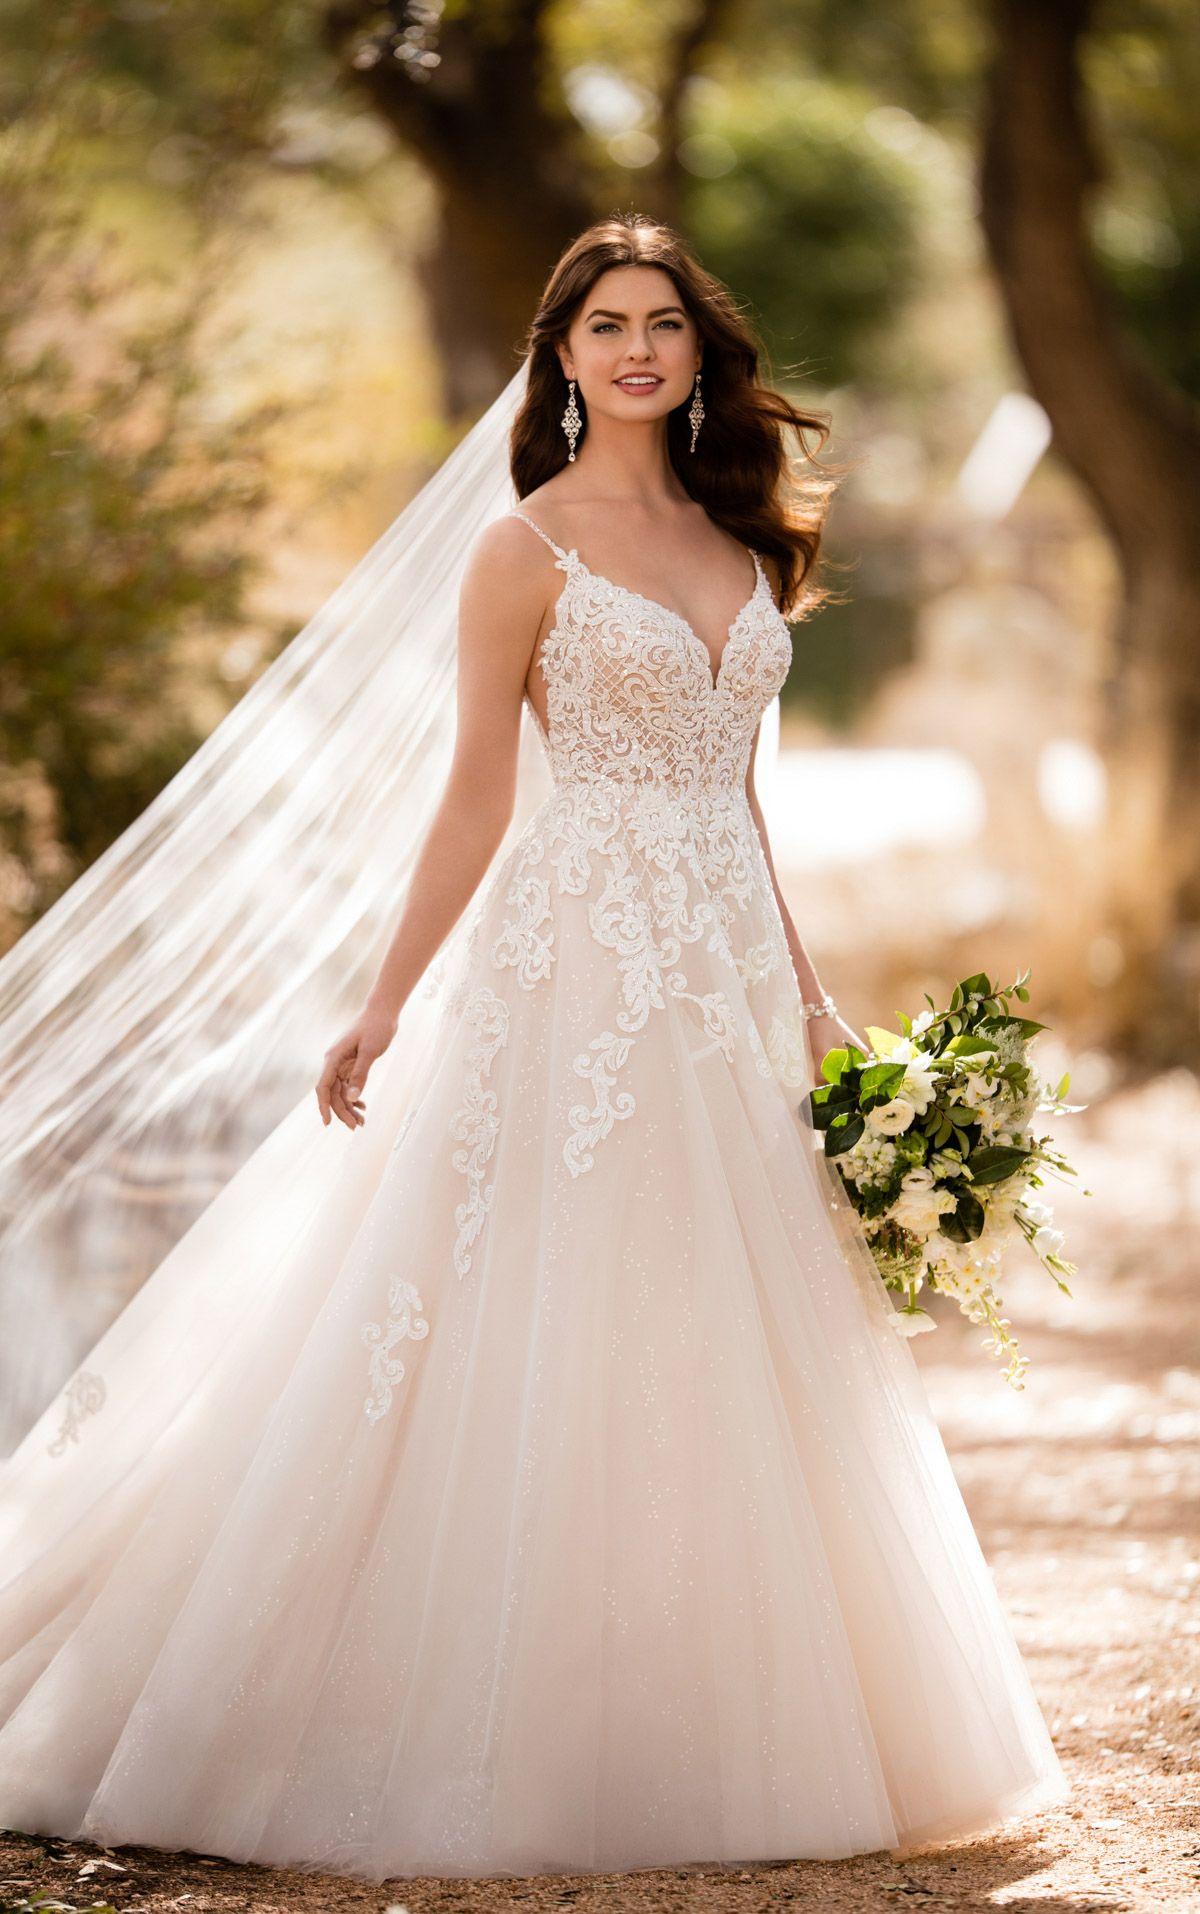 Boho wedding dresses boho beautiful wedding dress and australia